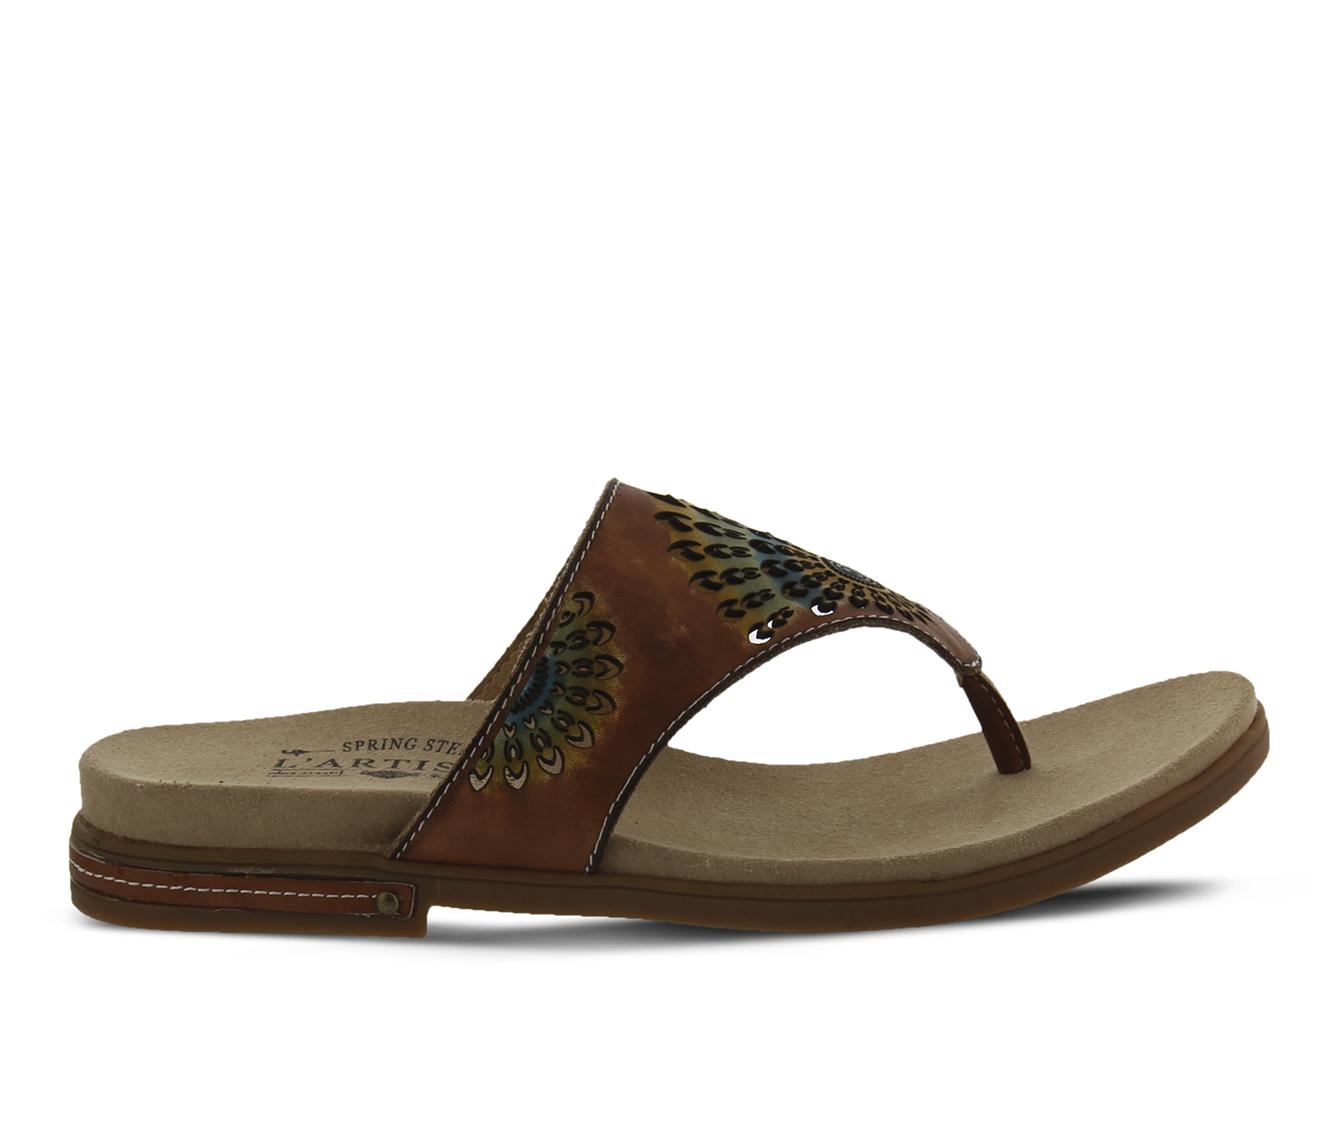 L'Artiste Mayura Women's Sandal (Brown Leather)